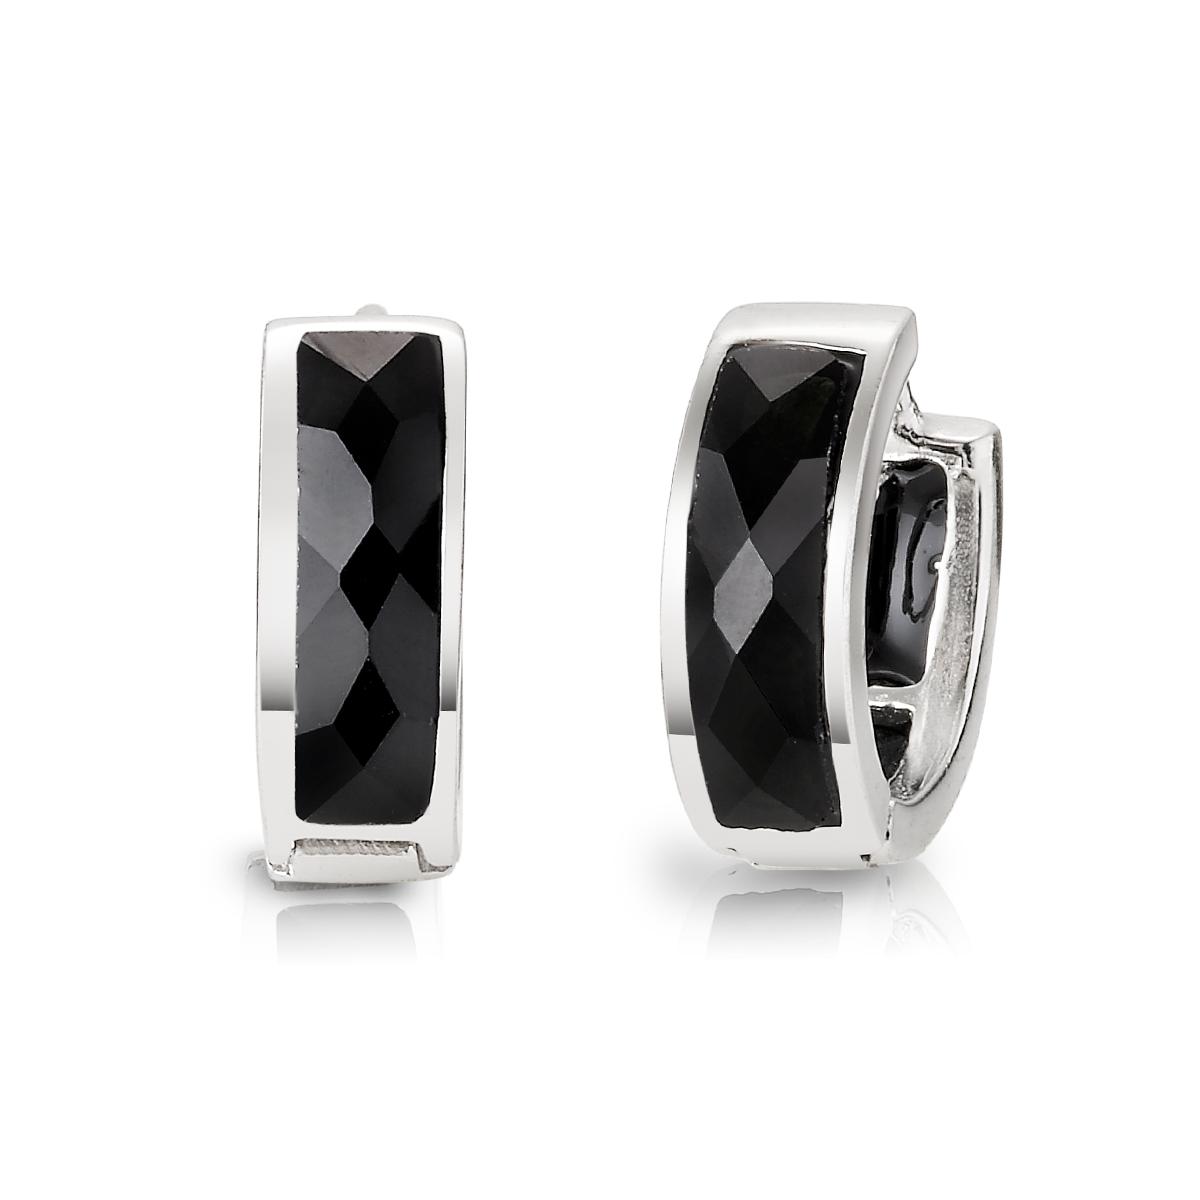 ES10 暢銷酷炫耳環/一對販售